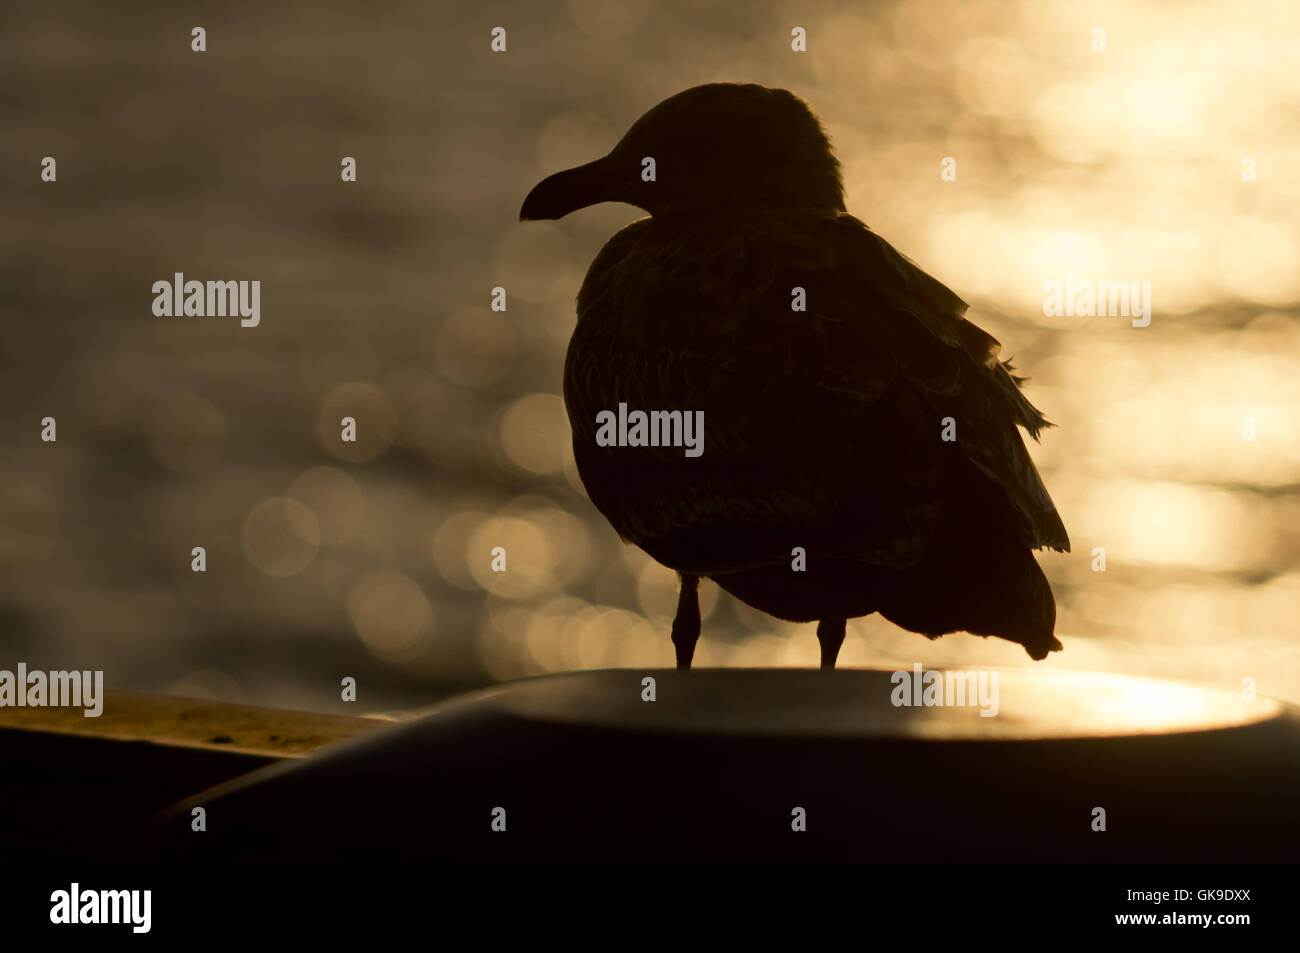 bird sunset shaddow - Stock Image